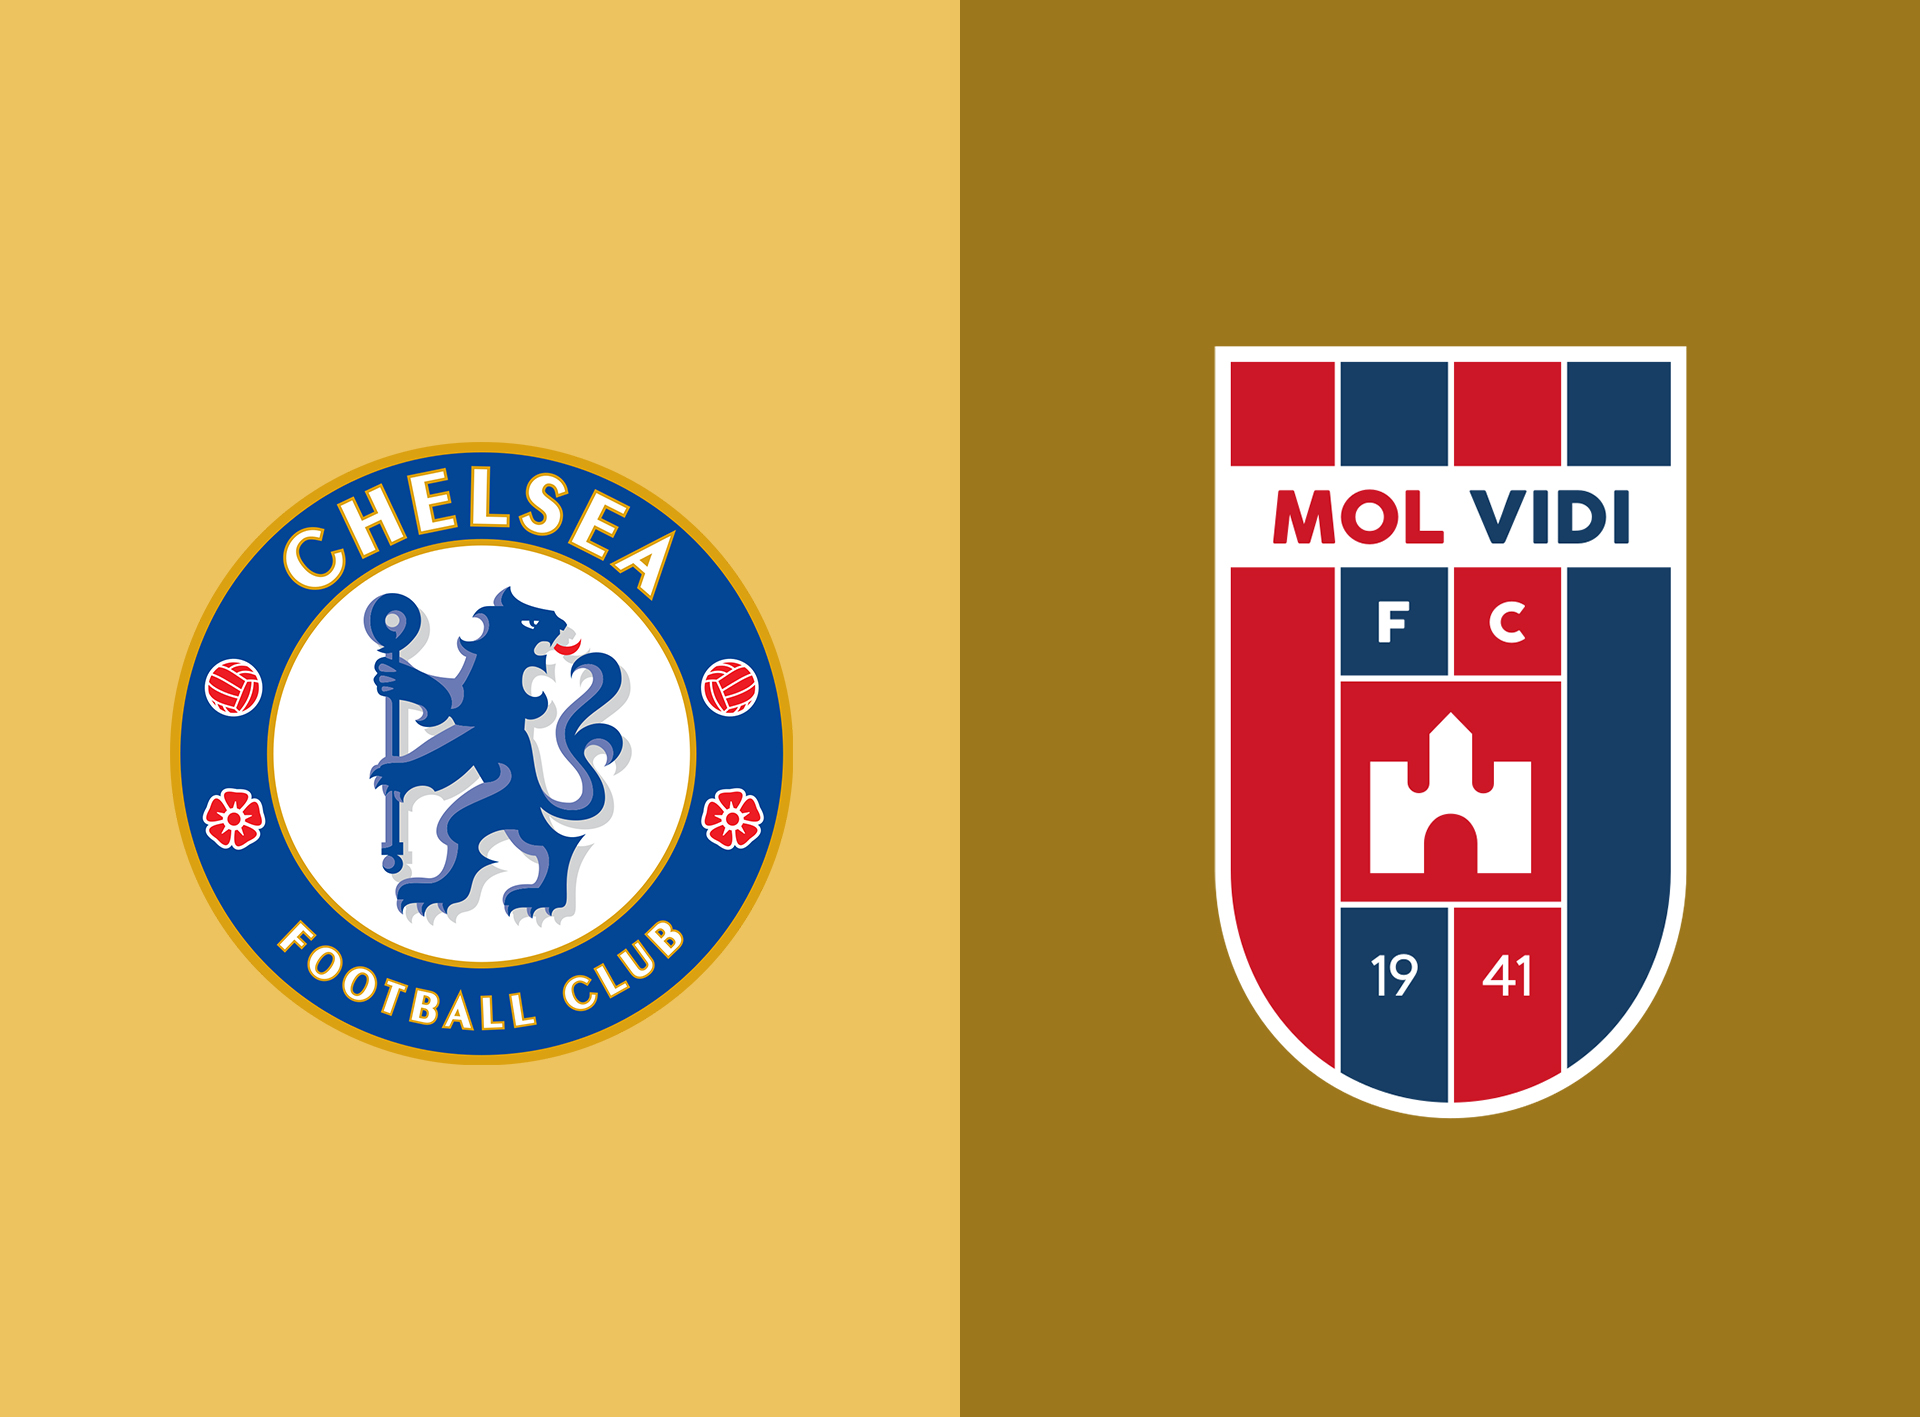 chelsea-vs-mol-vidi-tip-bong-da-5-10-2018 1